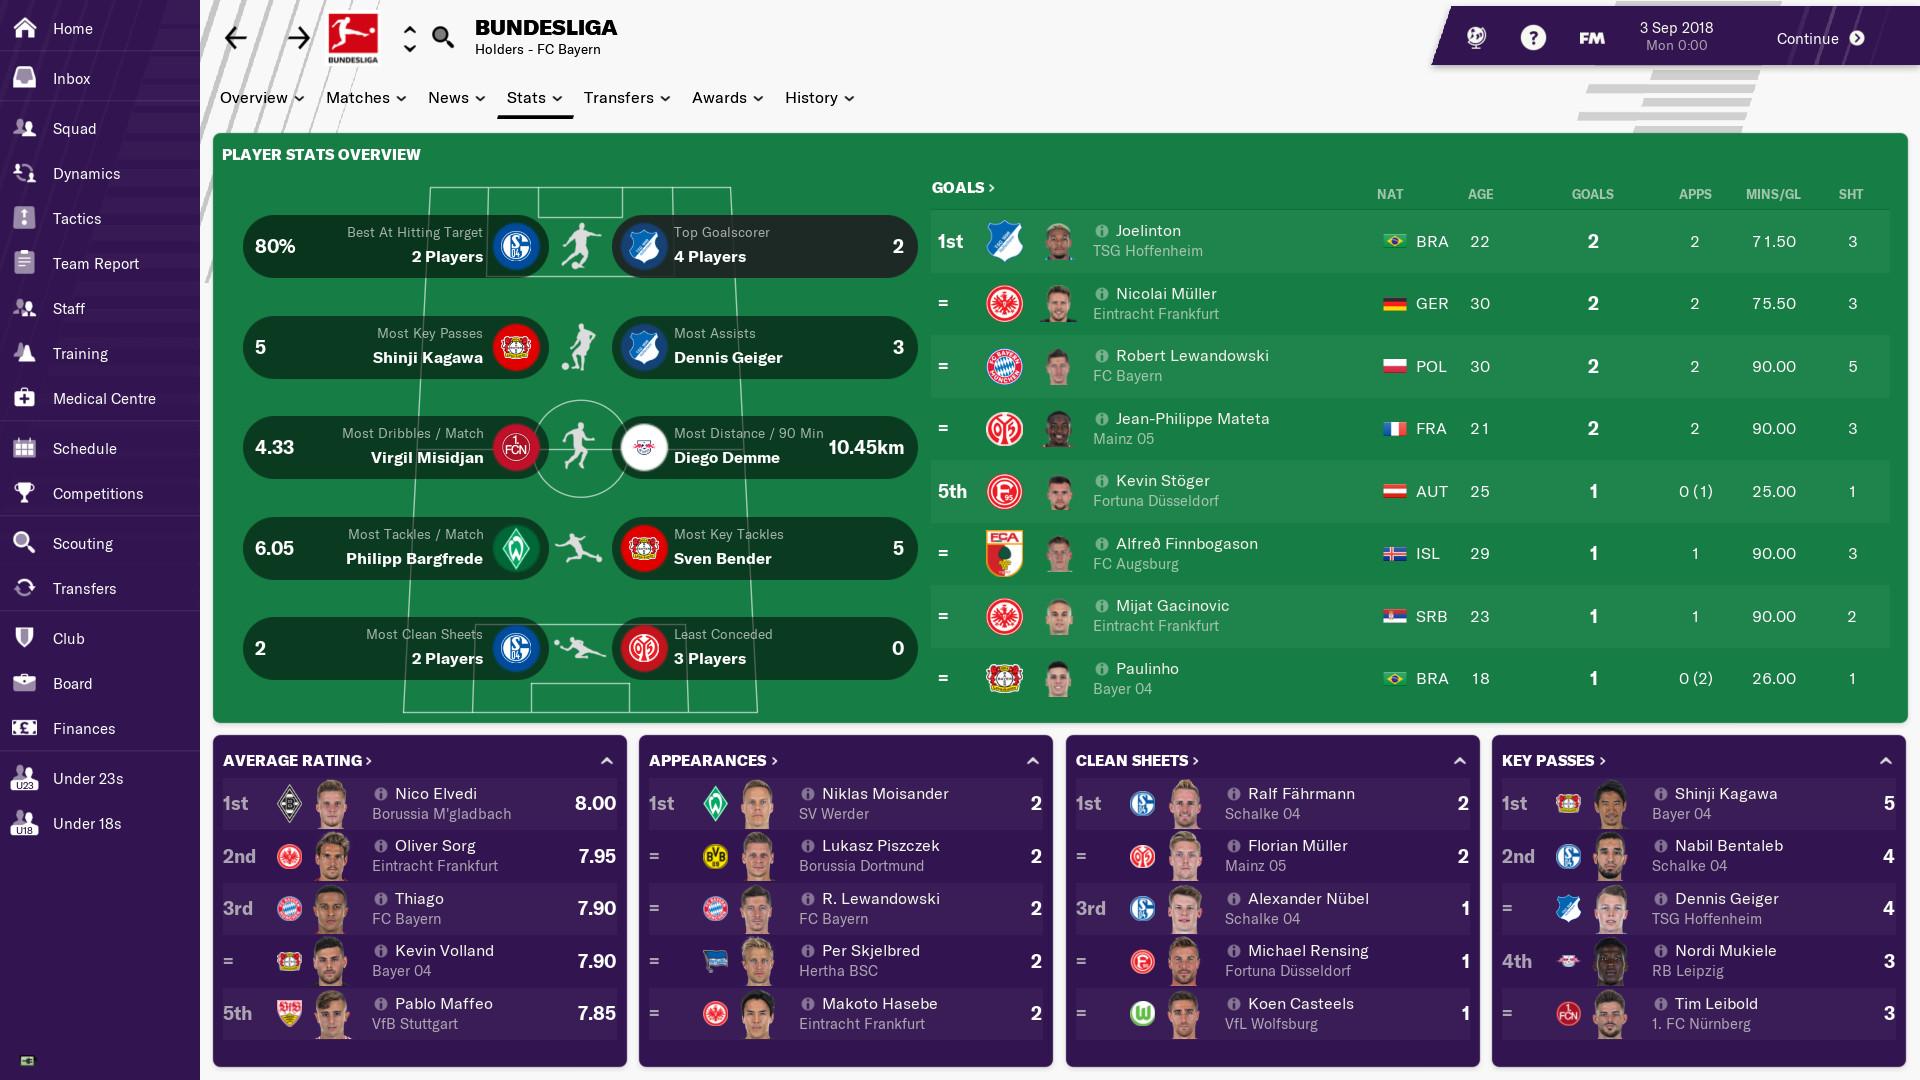 Football manager 2019 download completo portugues crackeado